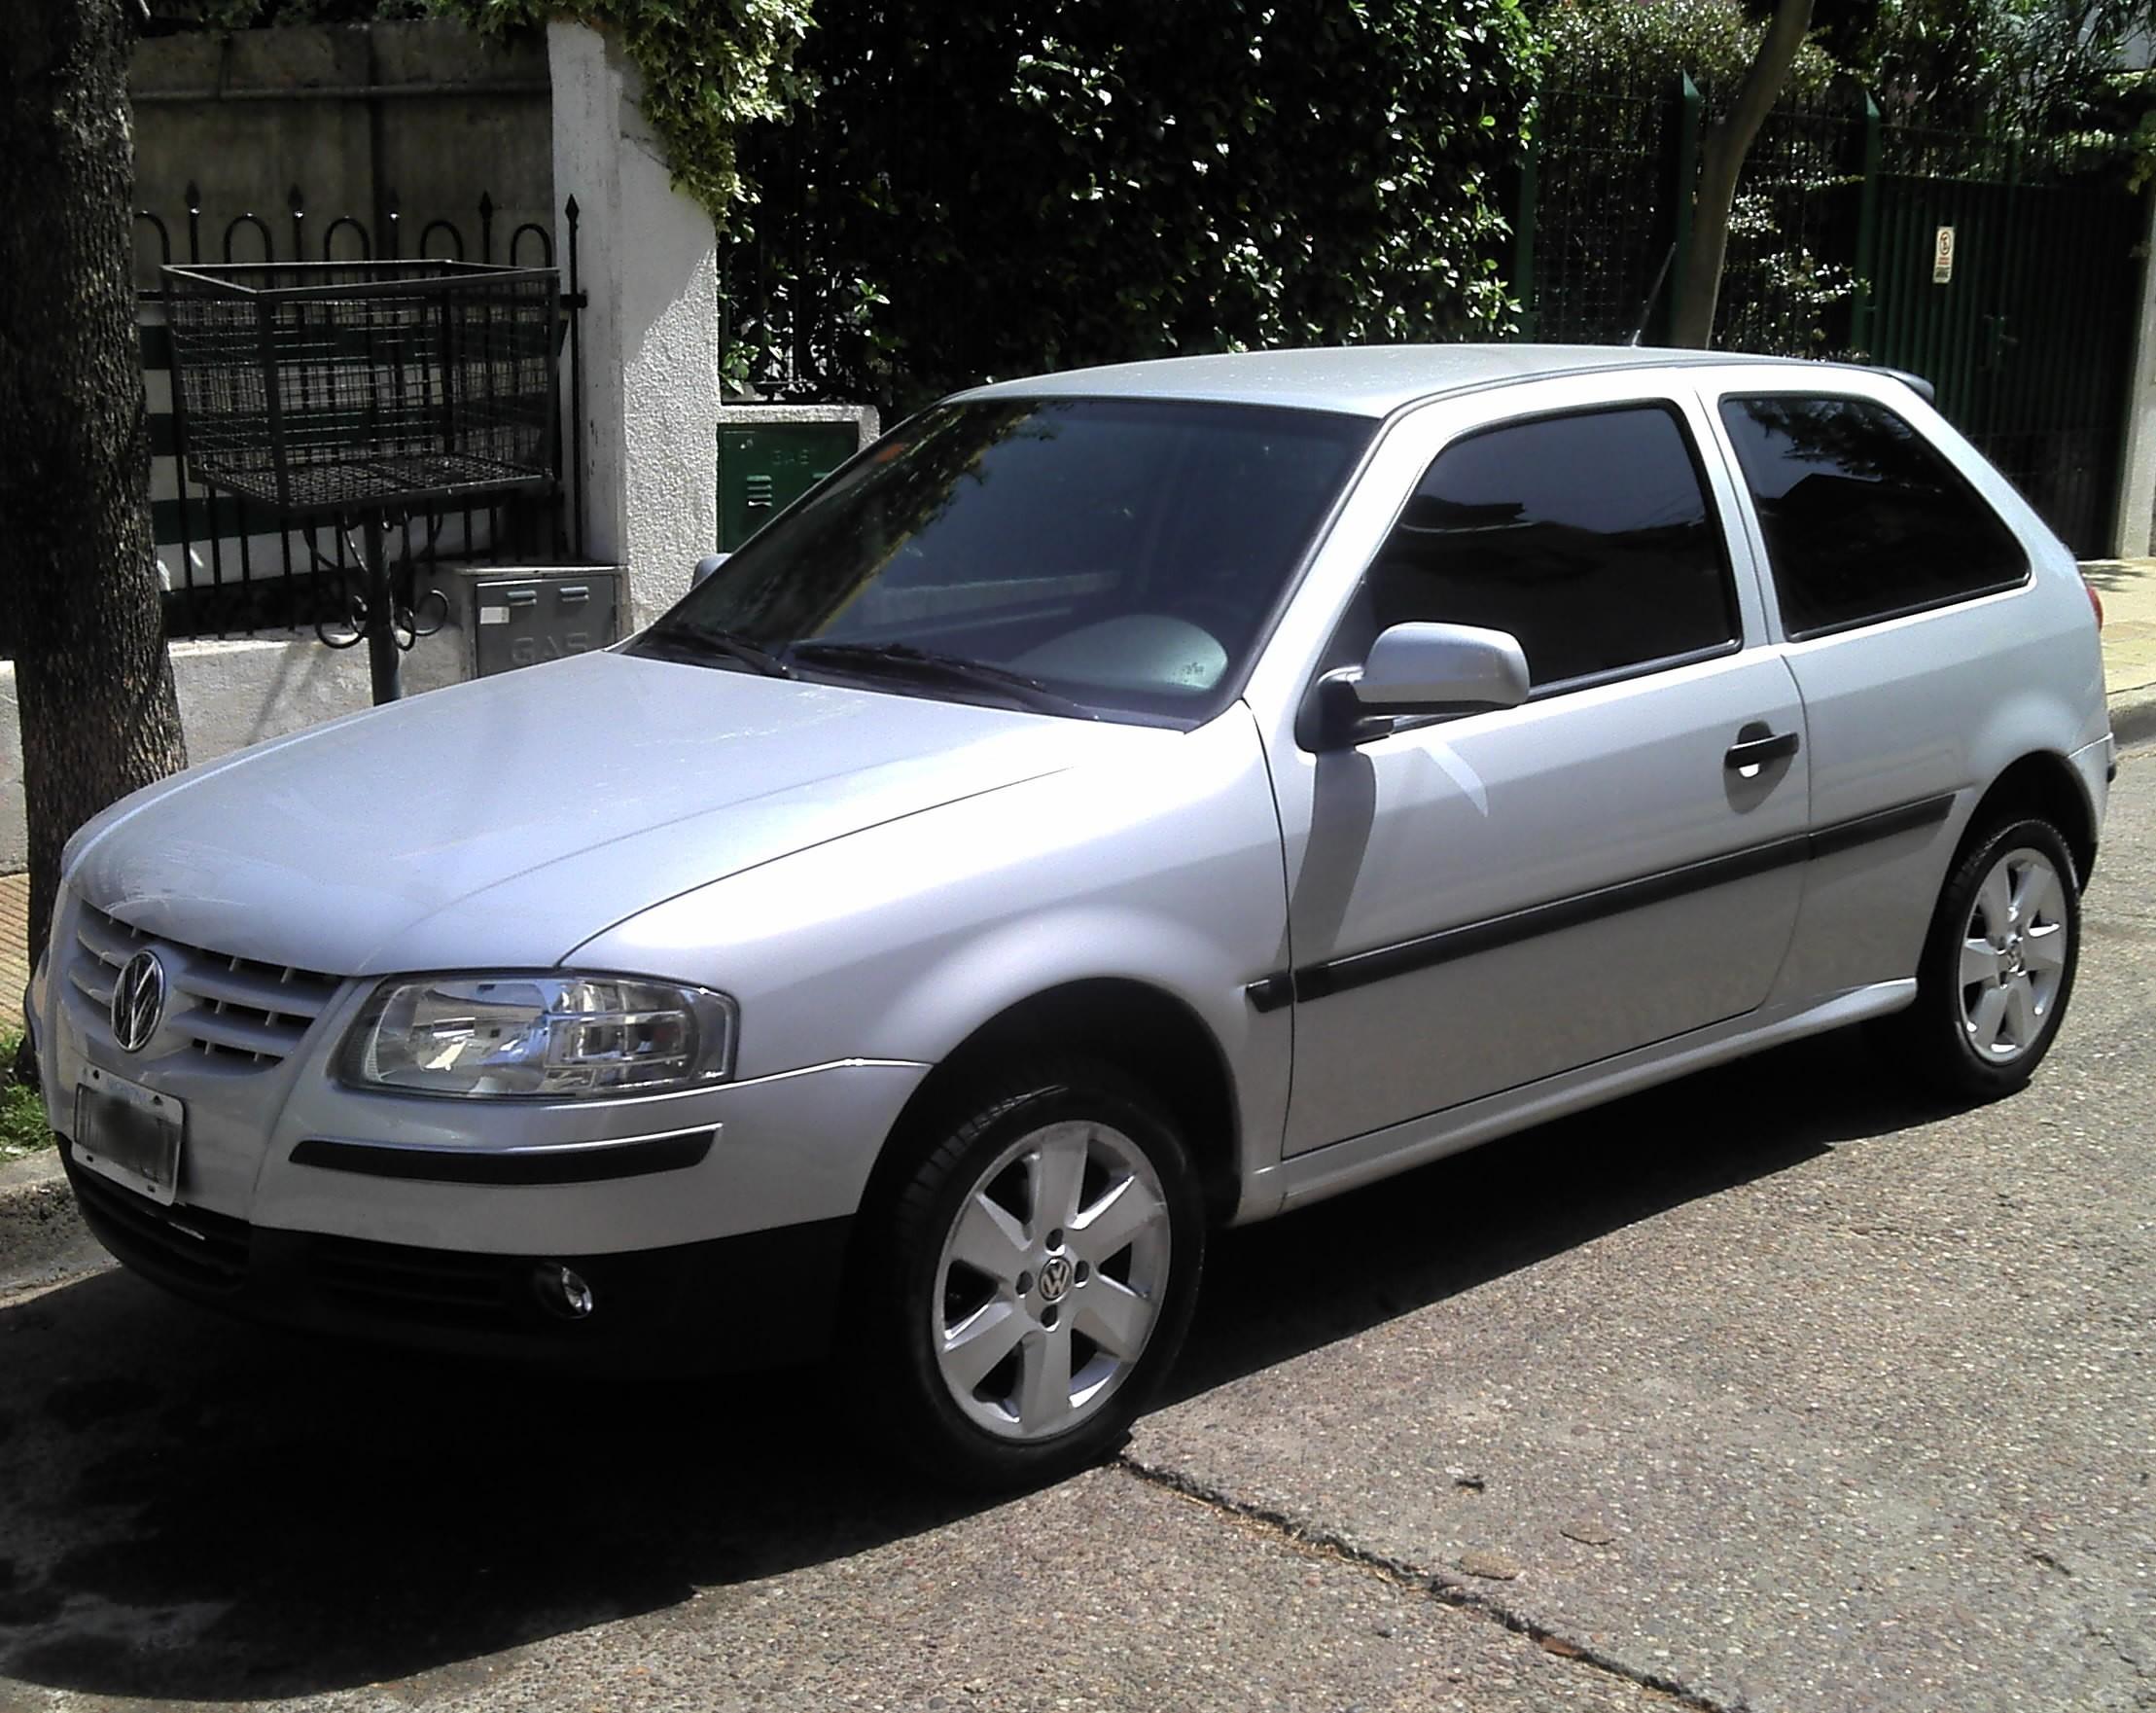 Volkswagen Gol (historia completa) - Taringa!